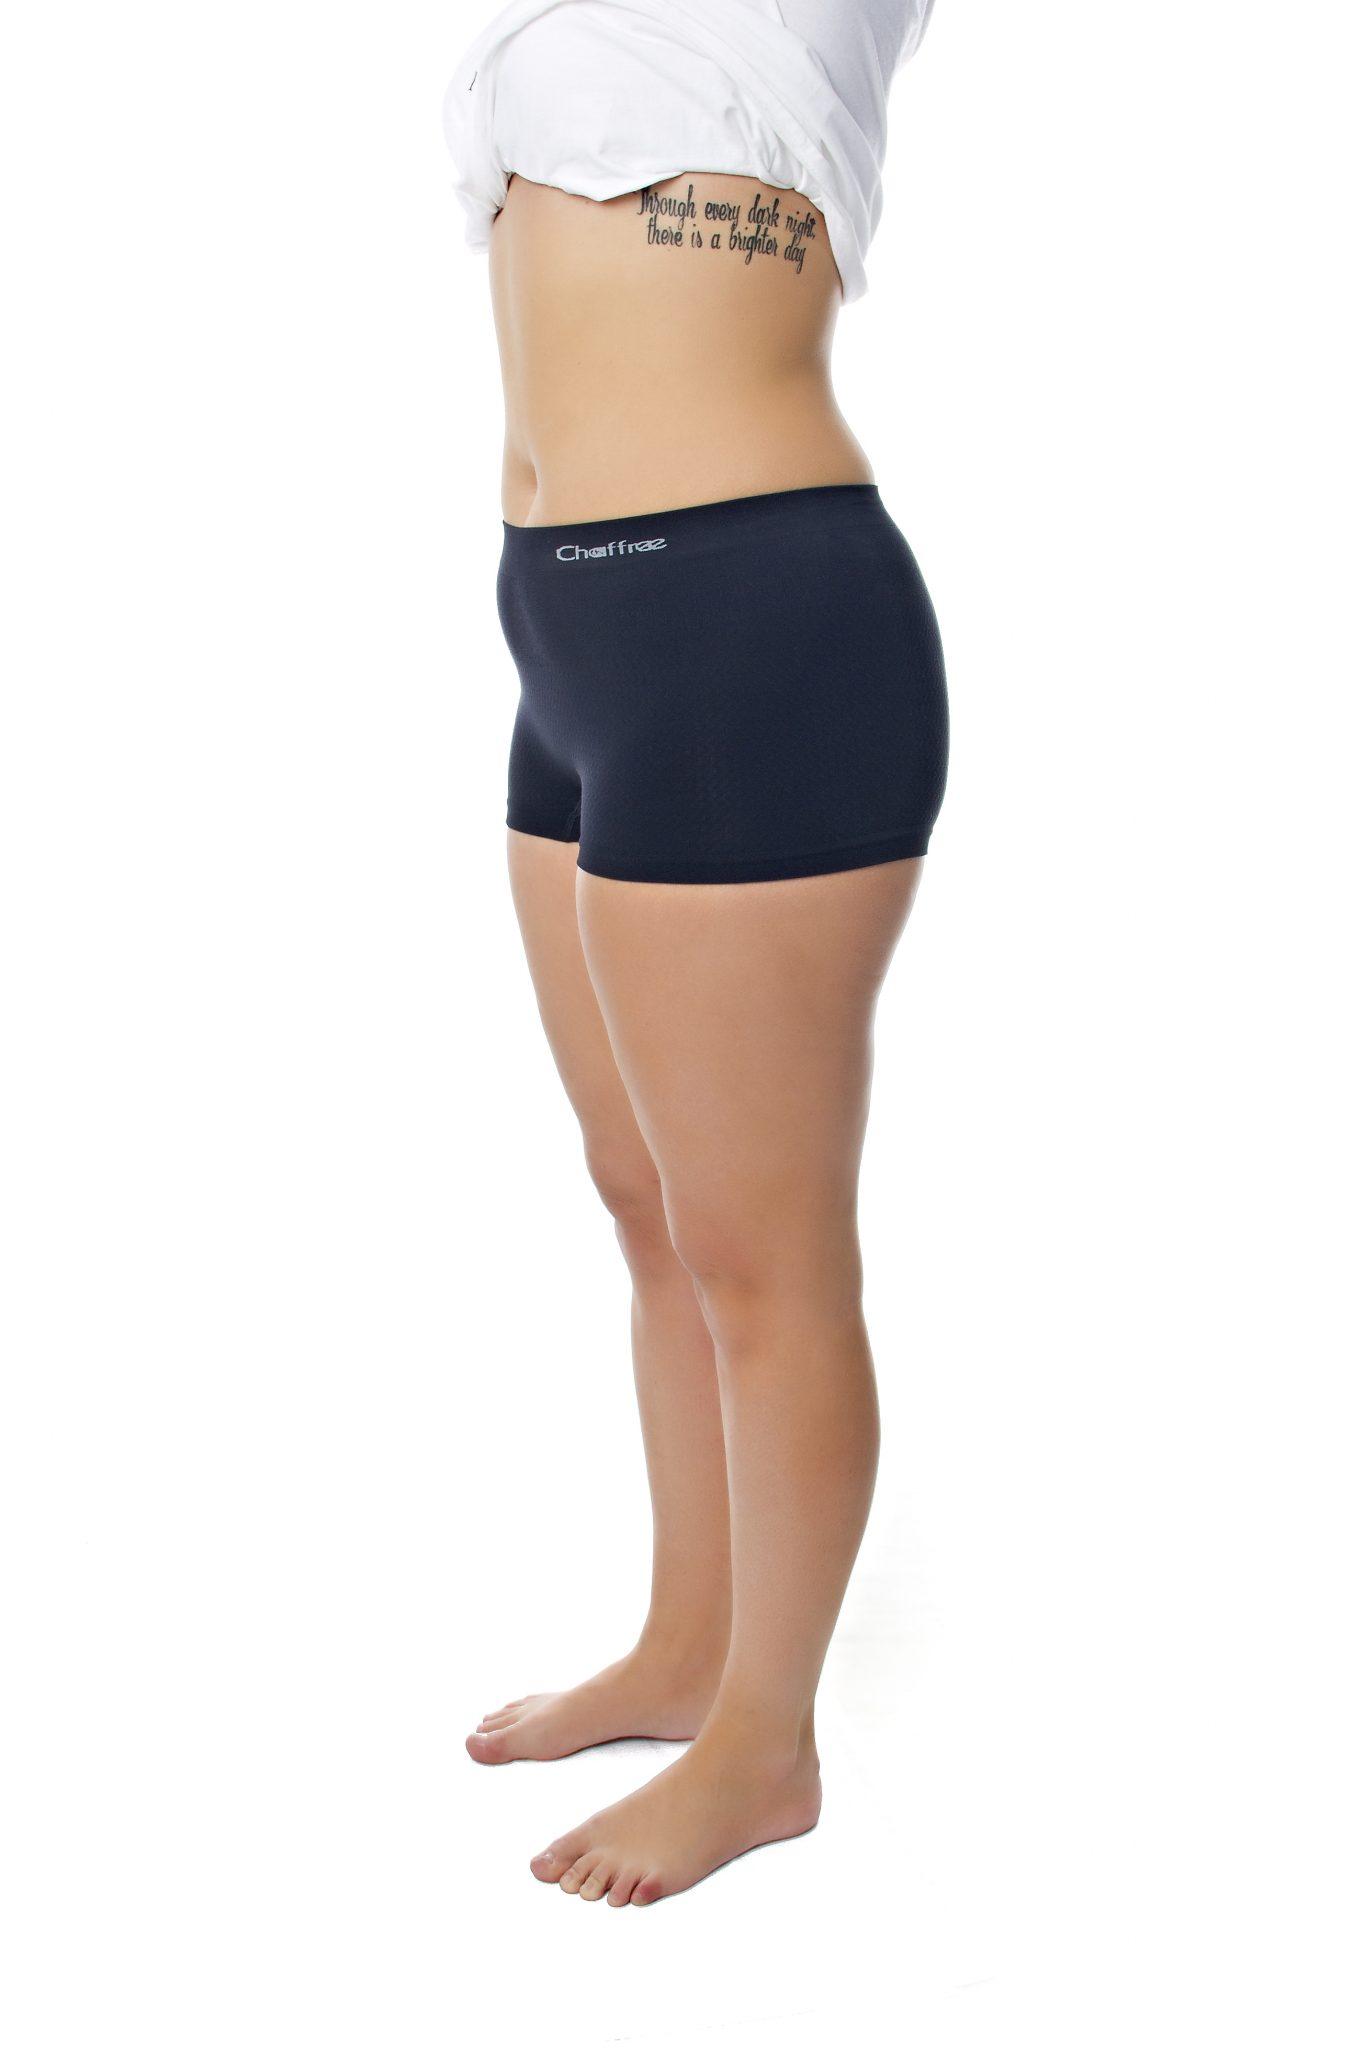 boxer shorts for women